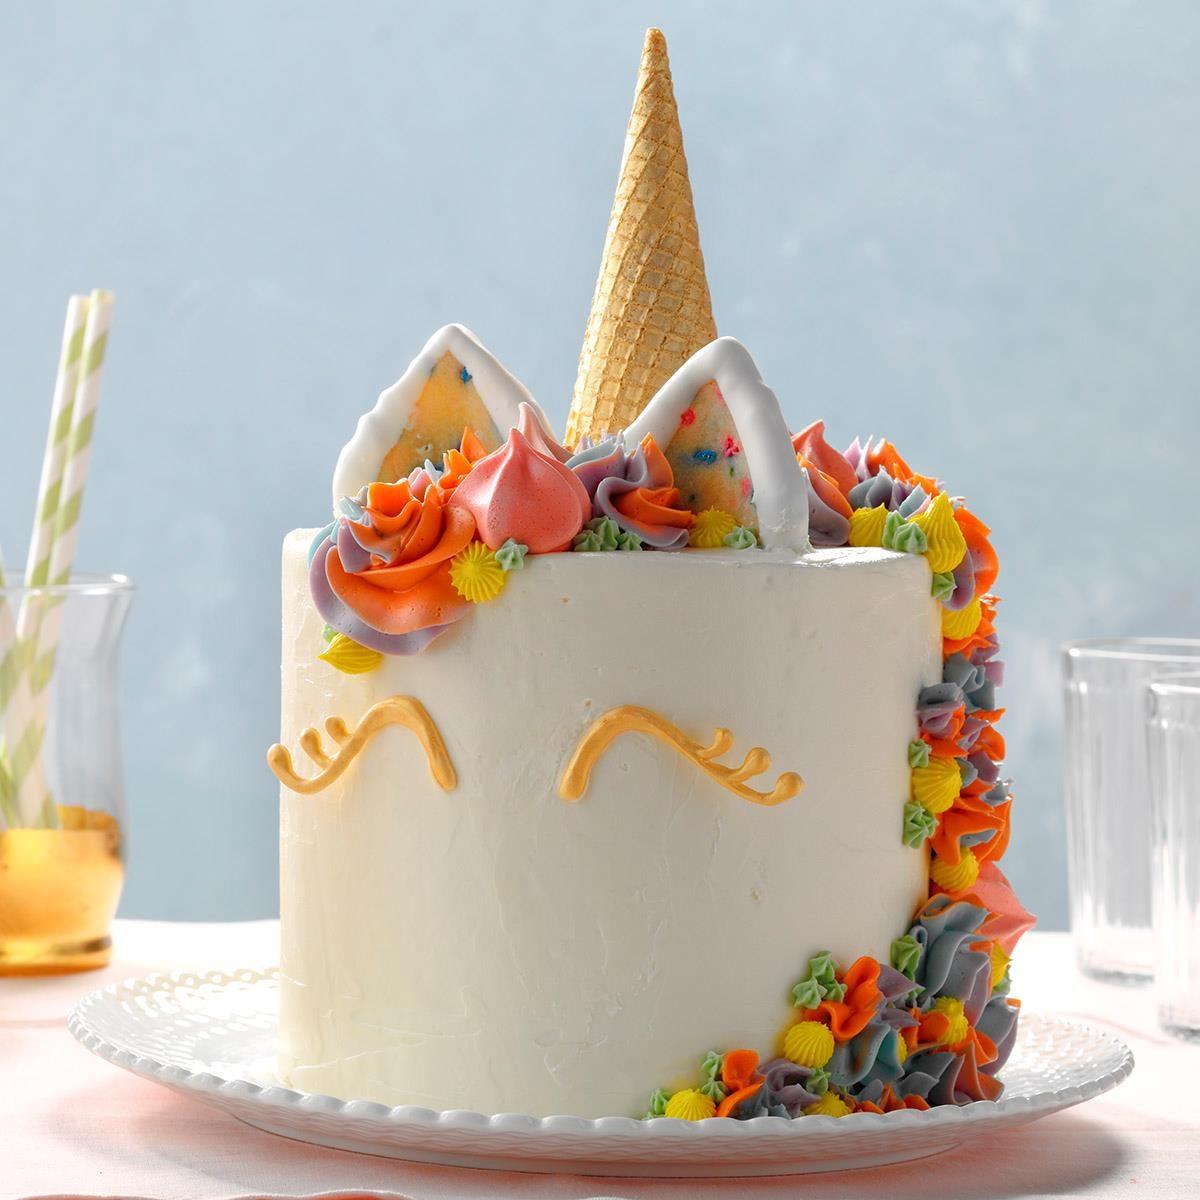 Unicorn Cake Recipe How To Make It Taste Of Home